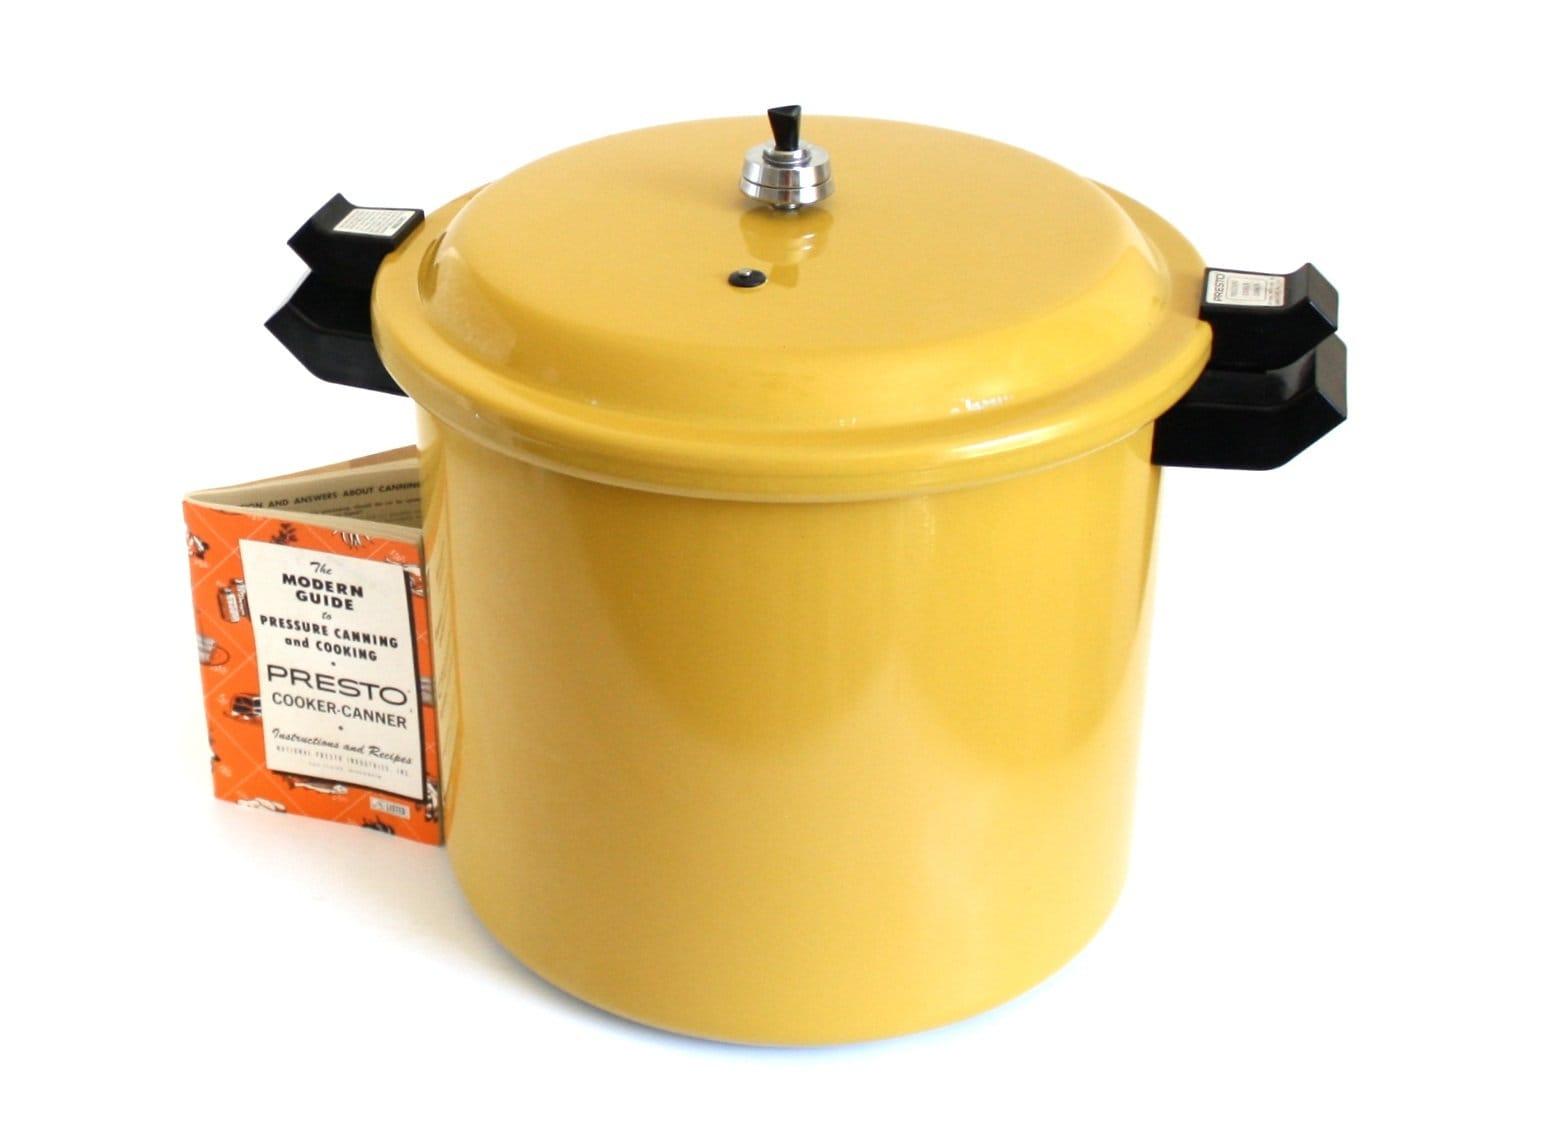 Presto Pressure Canner Large 20 Quart Size Holds Half Gallon